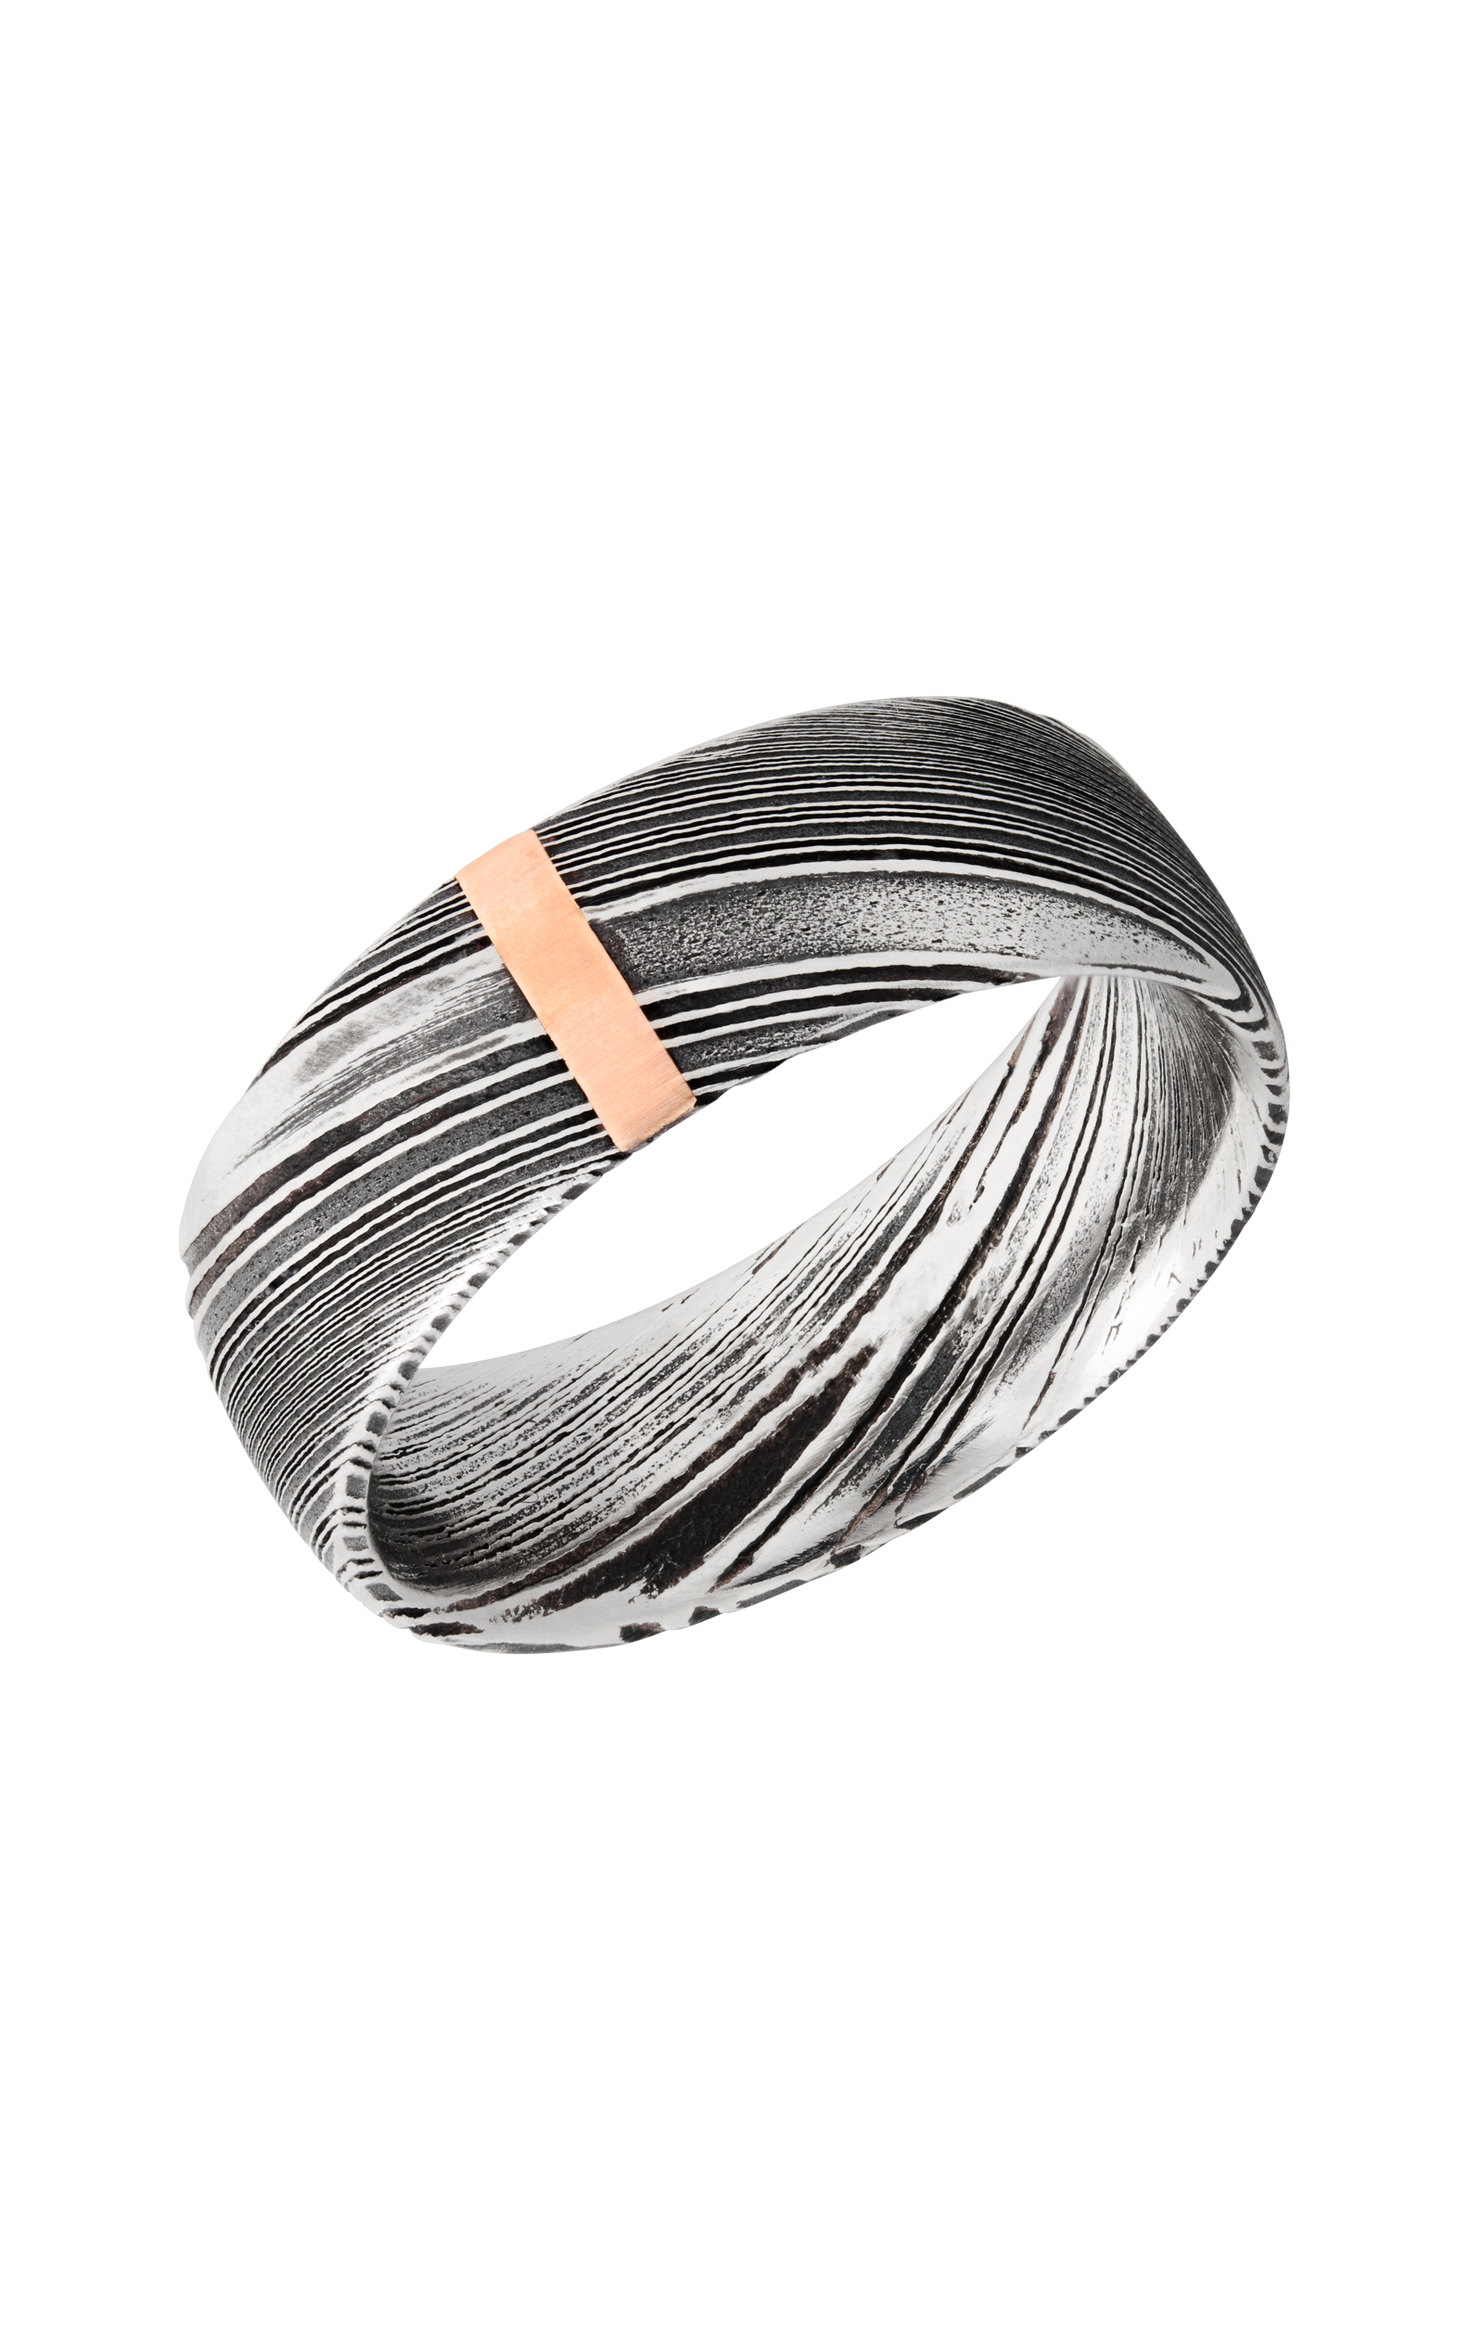 Lashbrook Damascus Steel D8D12VERTWOODGRAIN_14KR product image